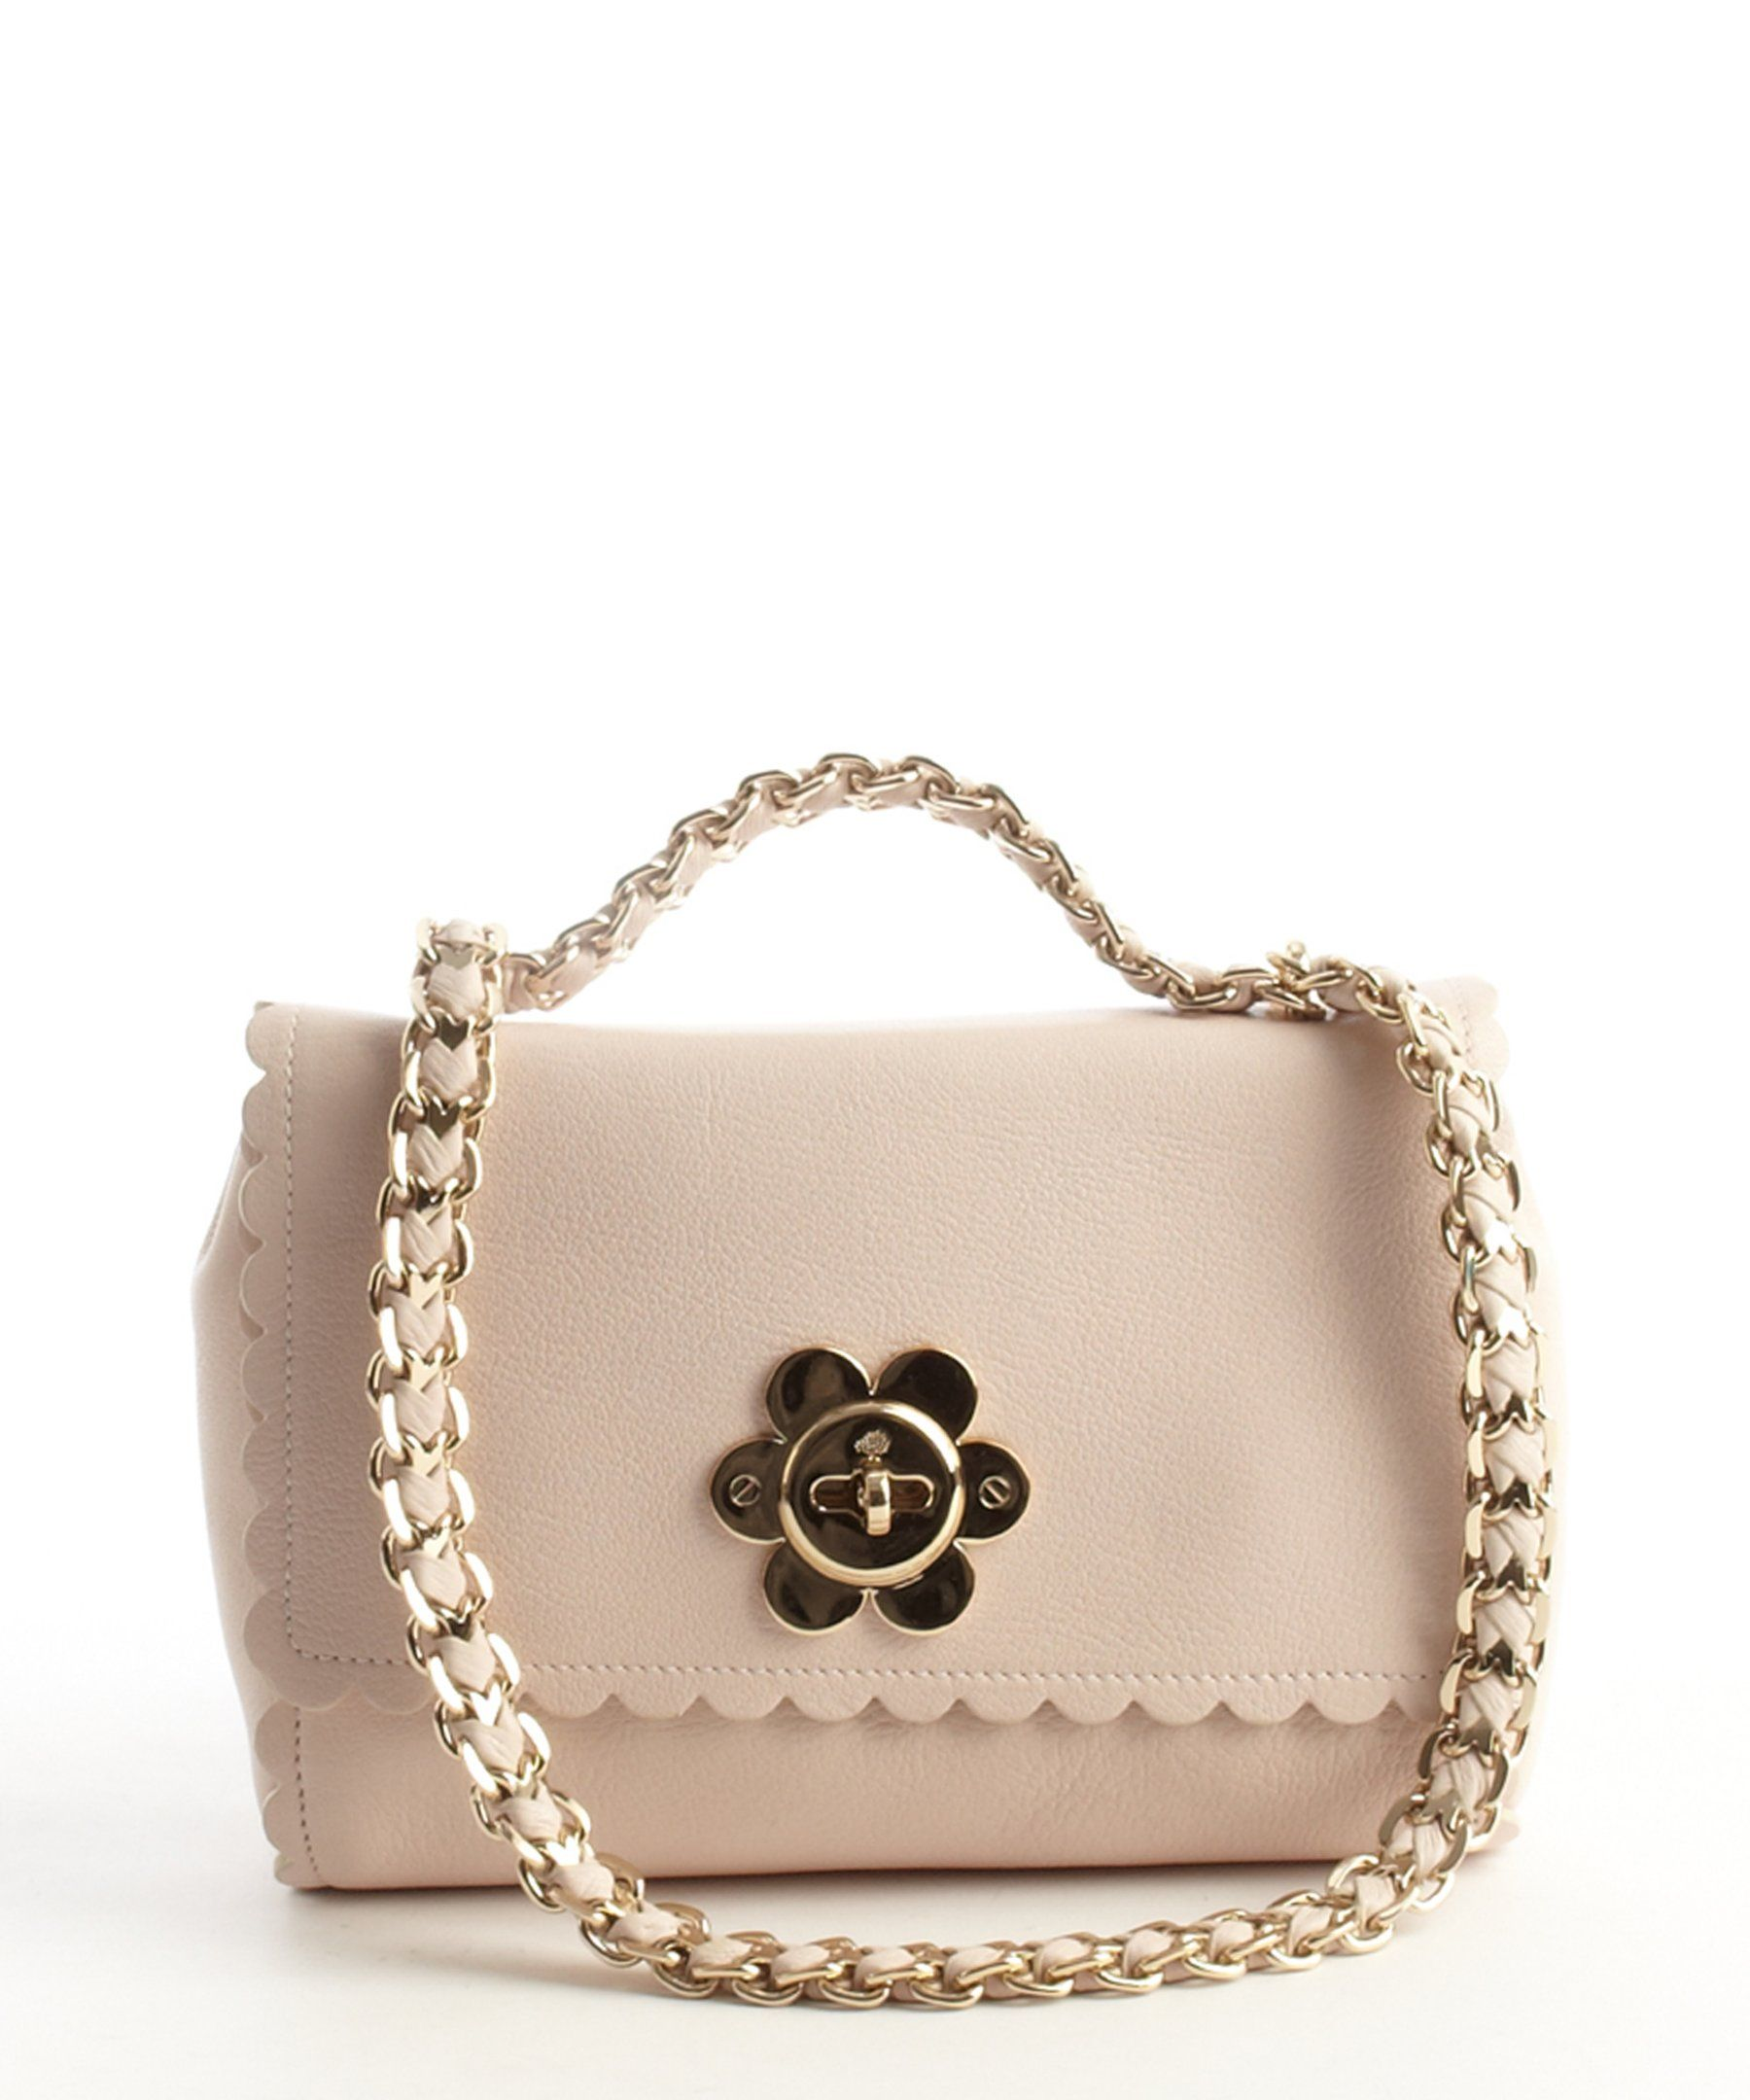 Mulberry light berry leather chainlink 'Lily' shoulder bag | BLUEFLY up to 70% off designer brands